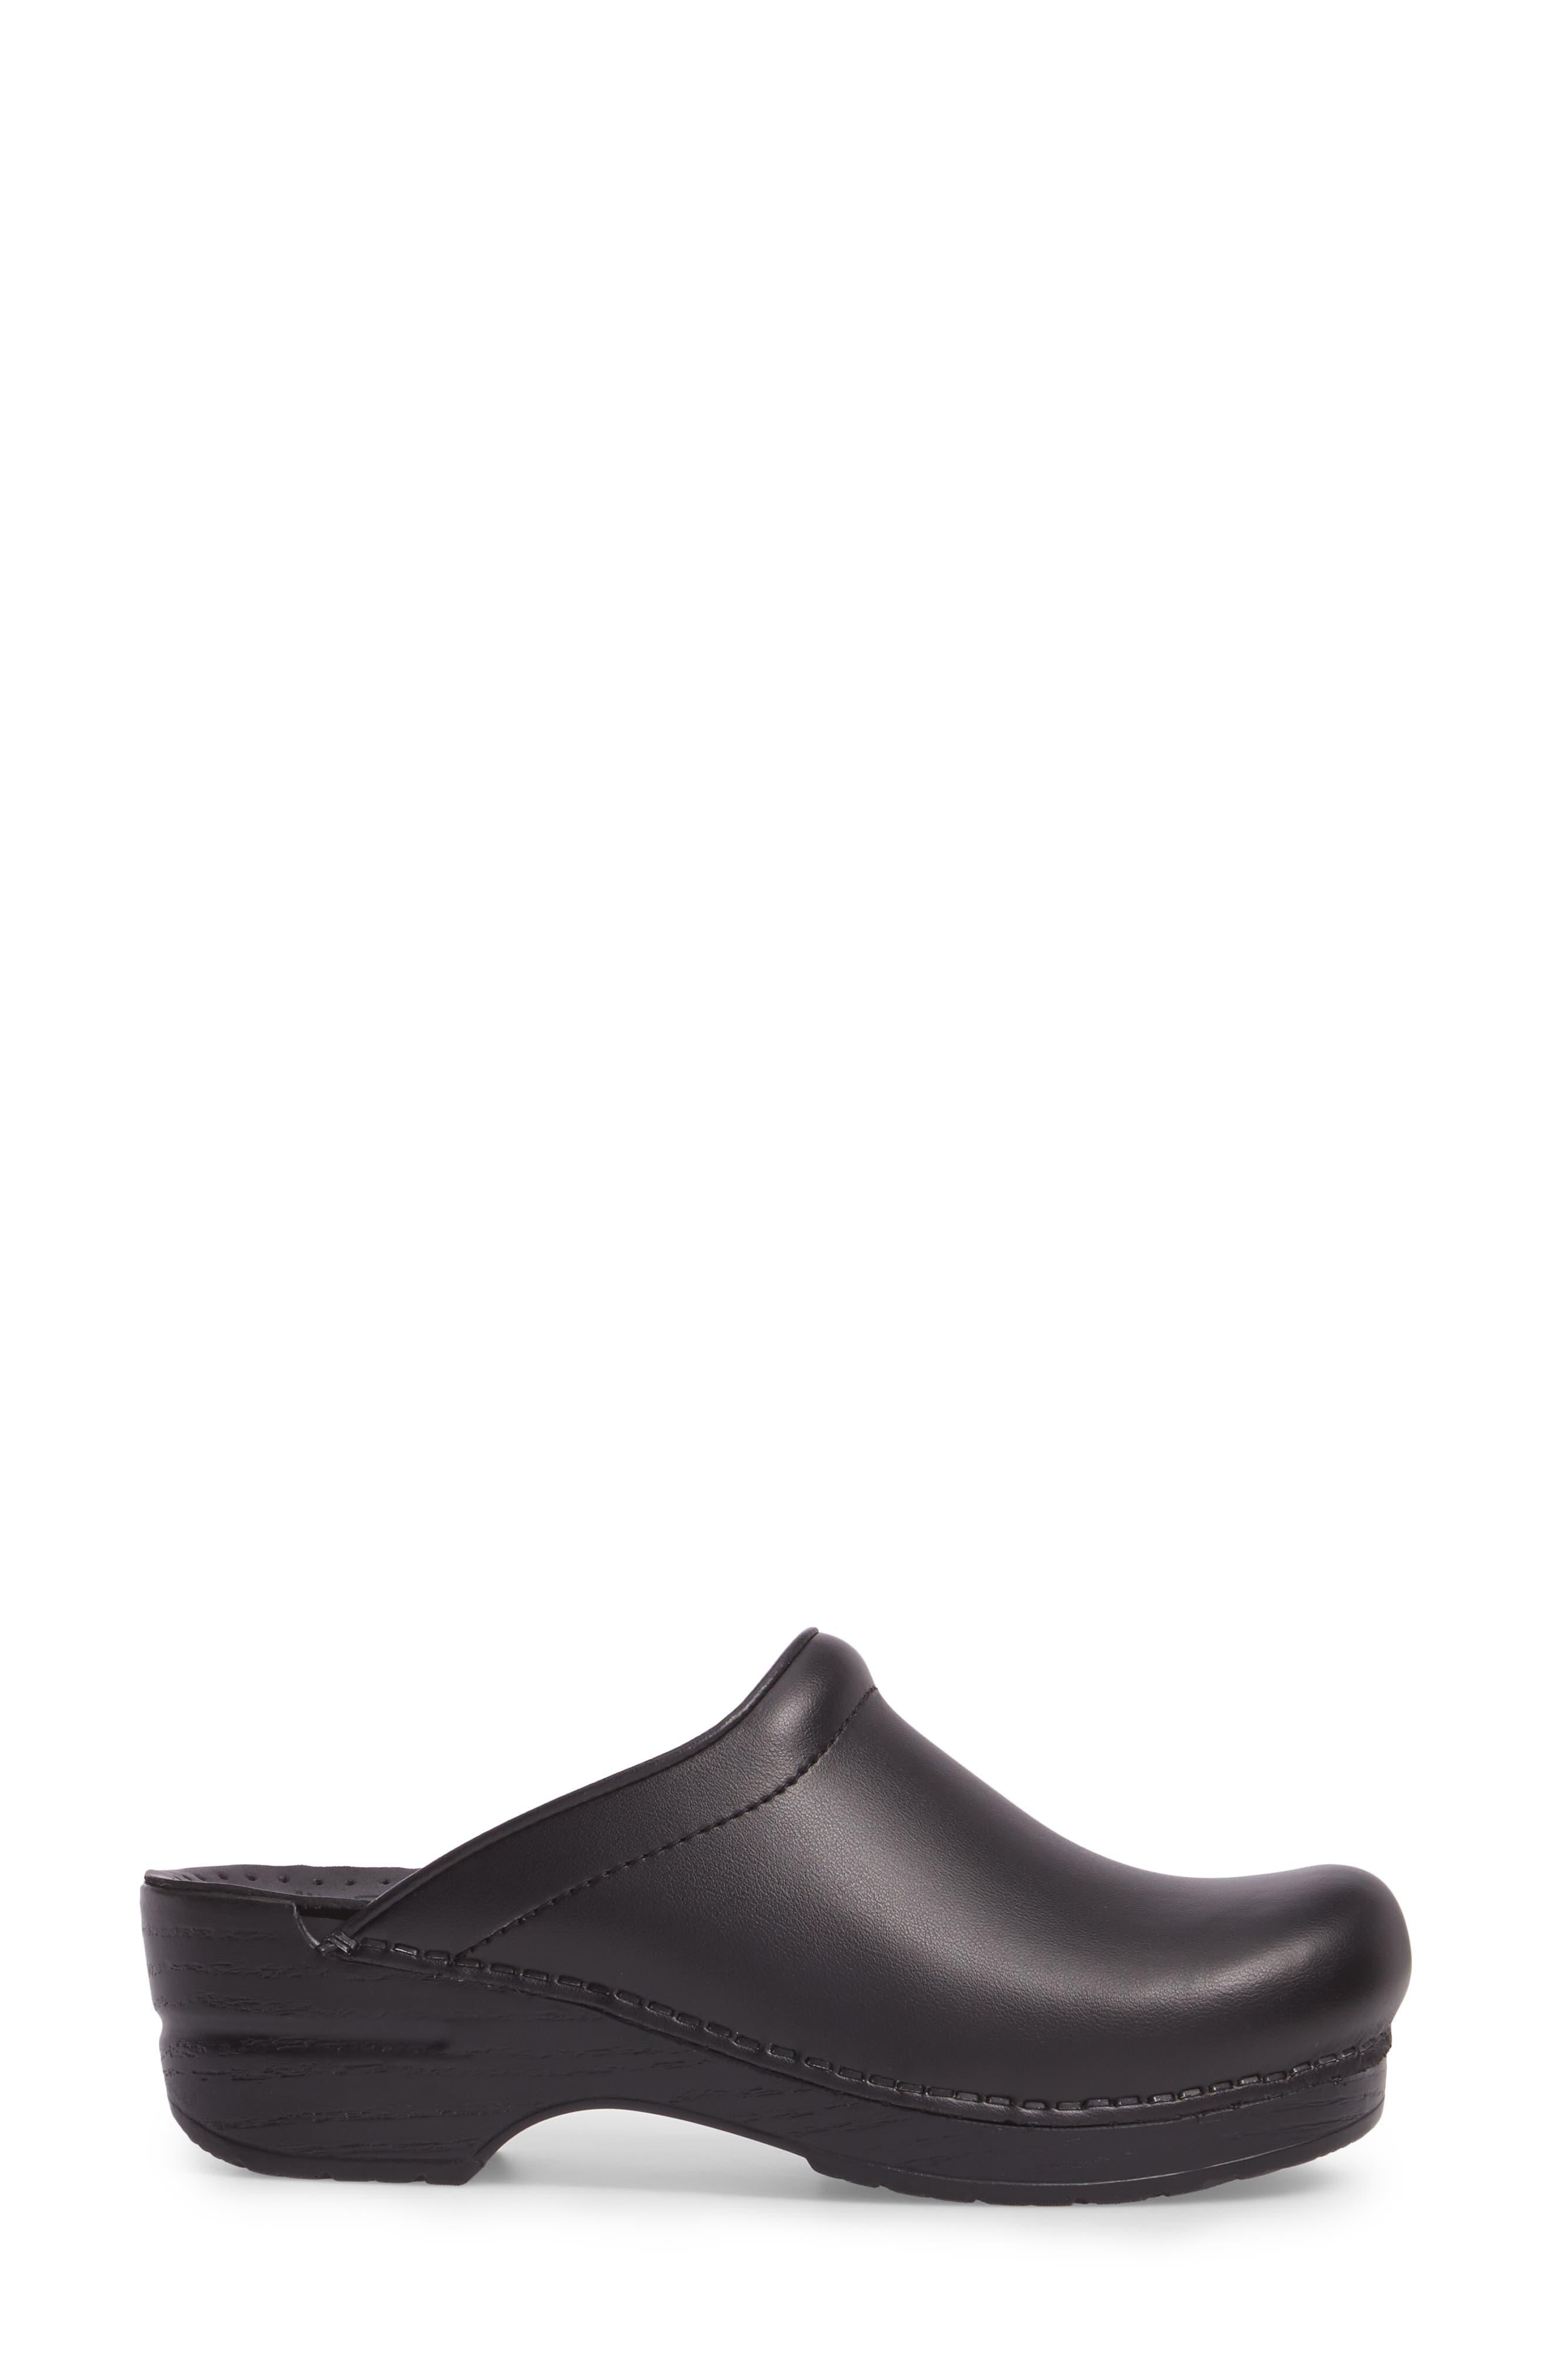 'Sonja' Patent Leather Clog,                             Alternate thumbnail 3, color,                             BLACK BOX LEATHER